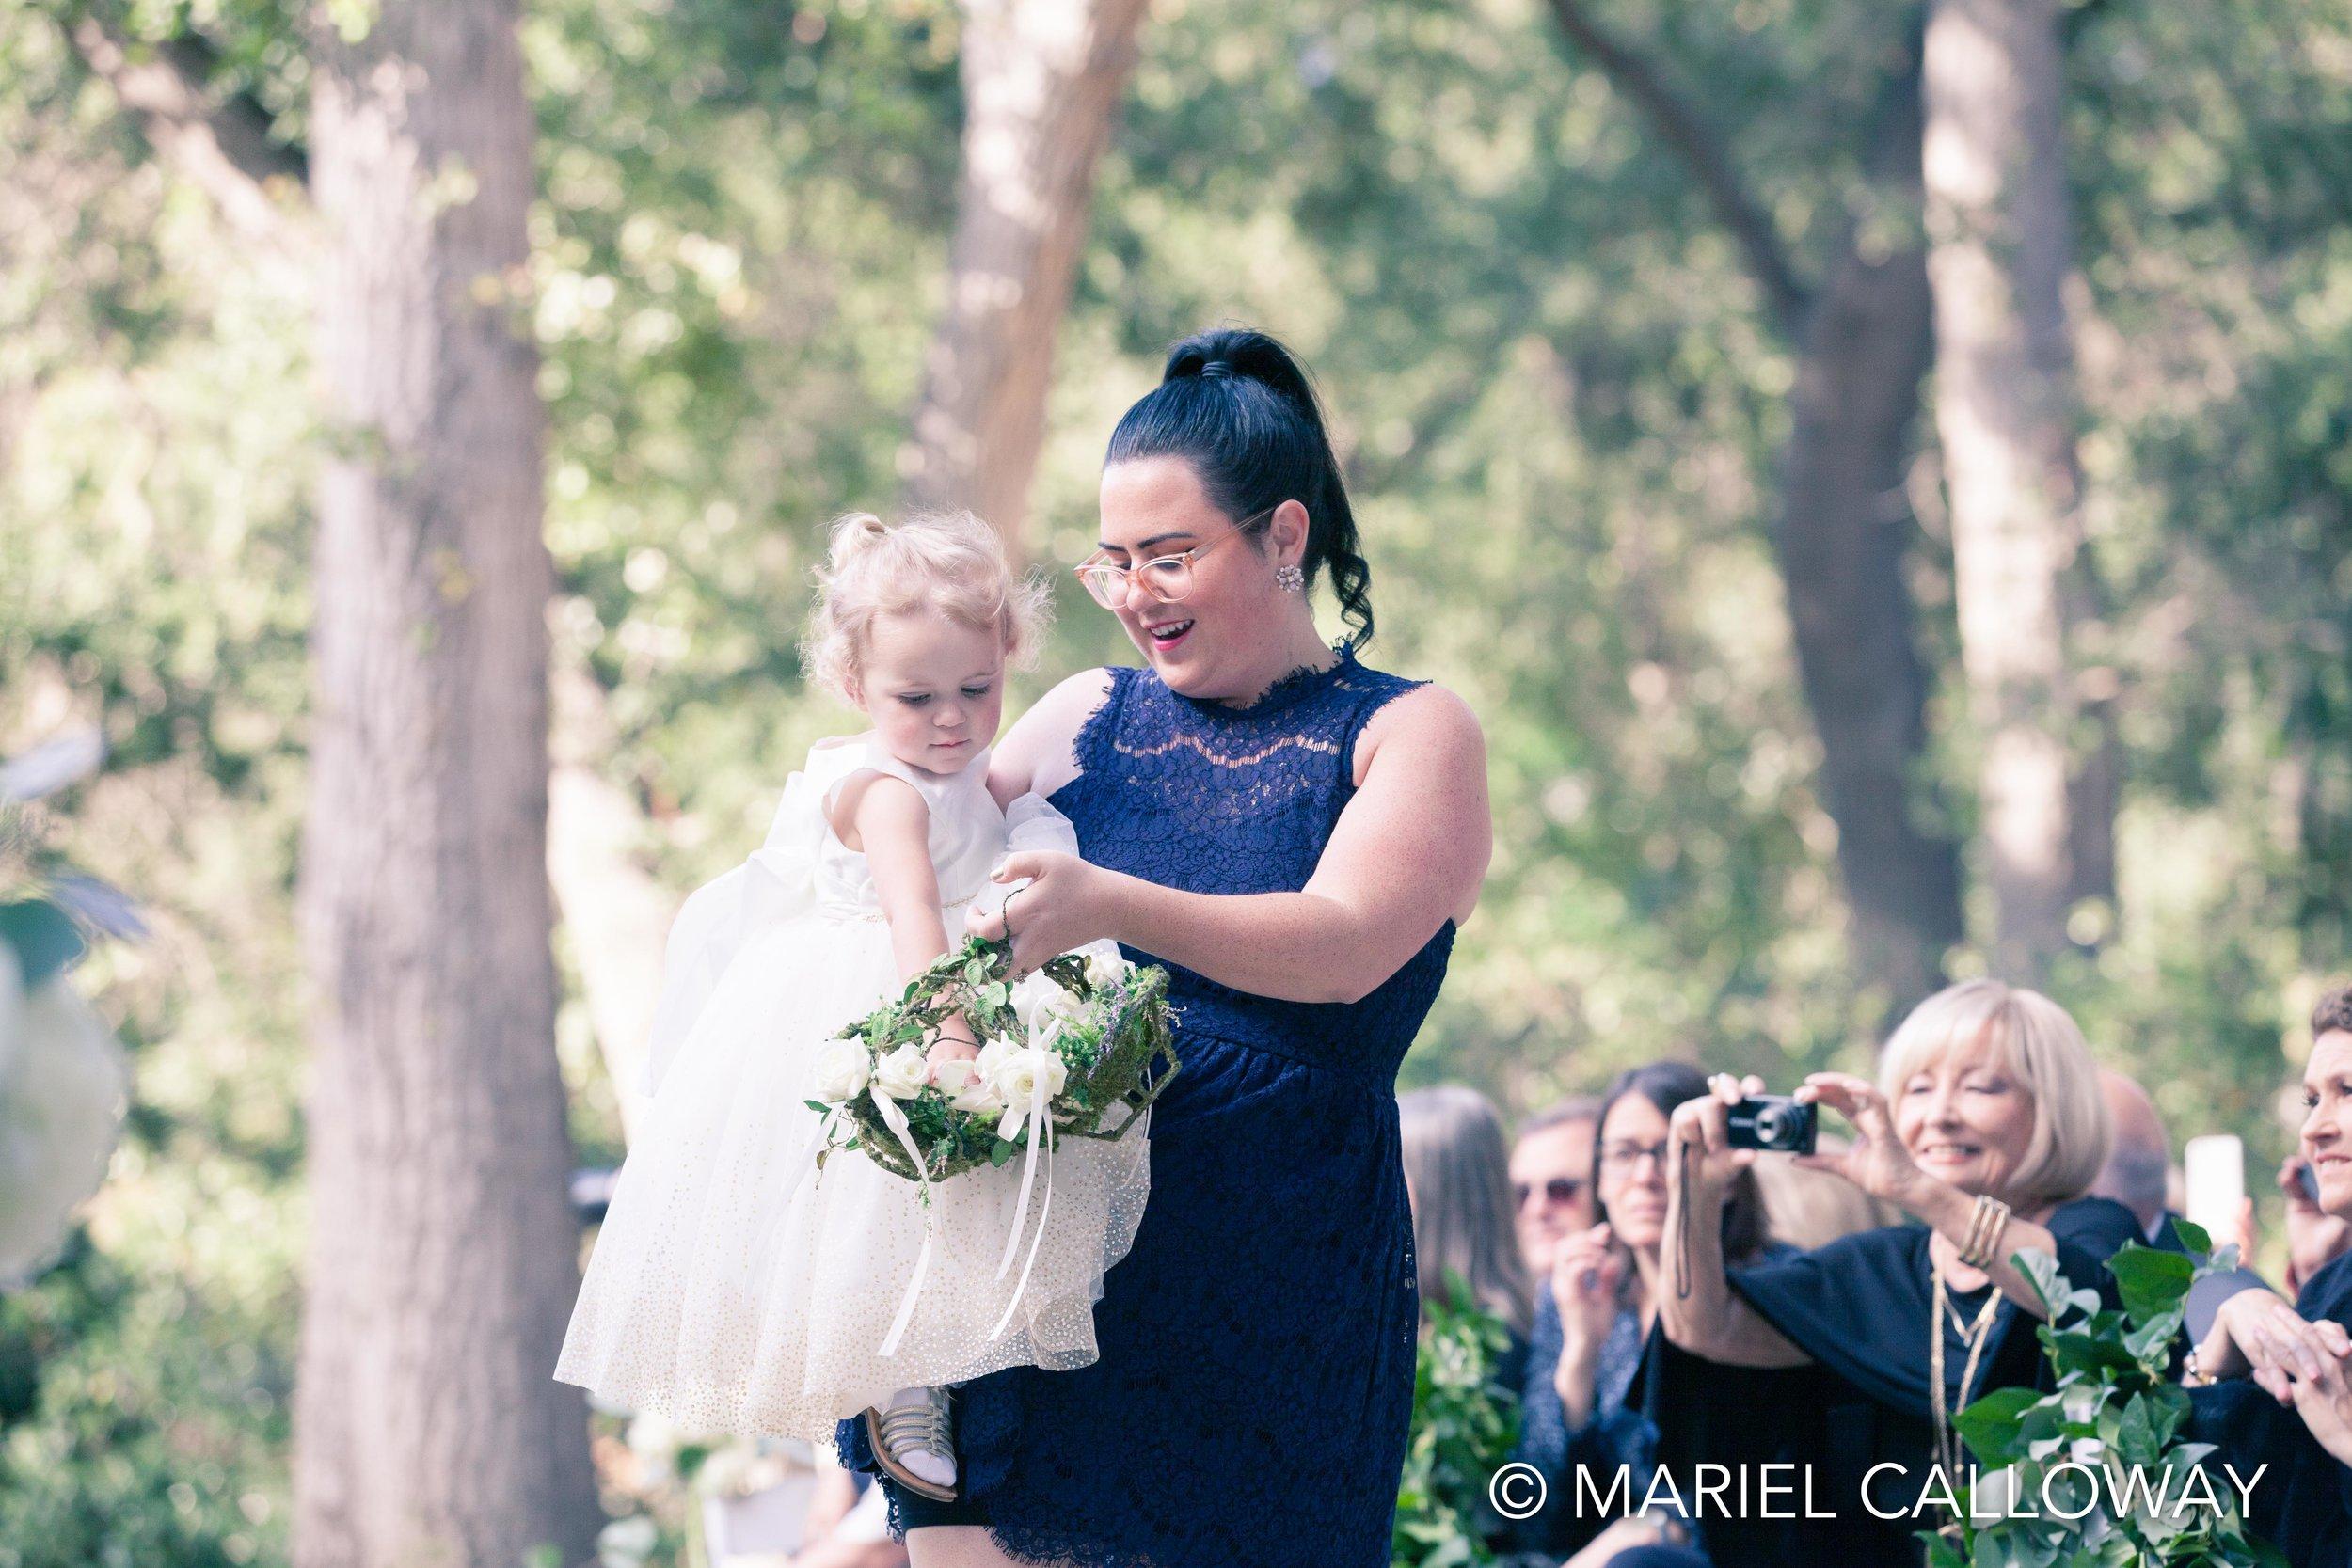 Mariel-Calloway-Los-Angeles-Wedding-Photography-Smith-22.jpg